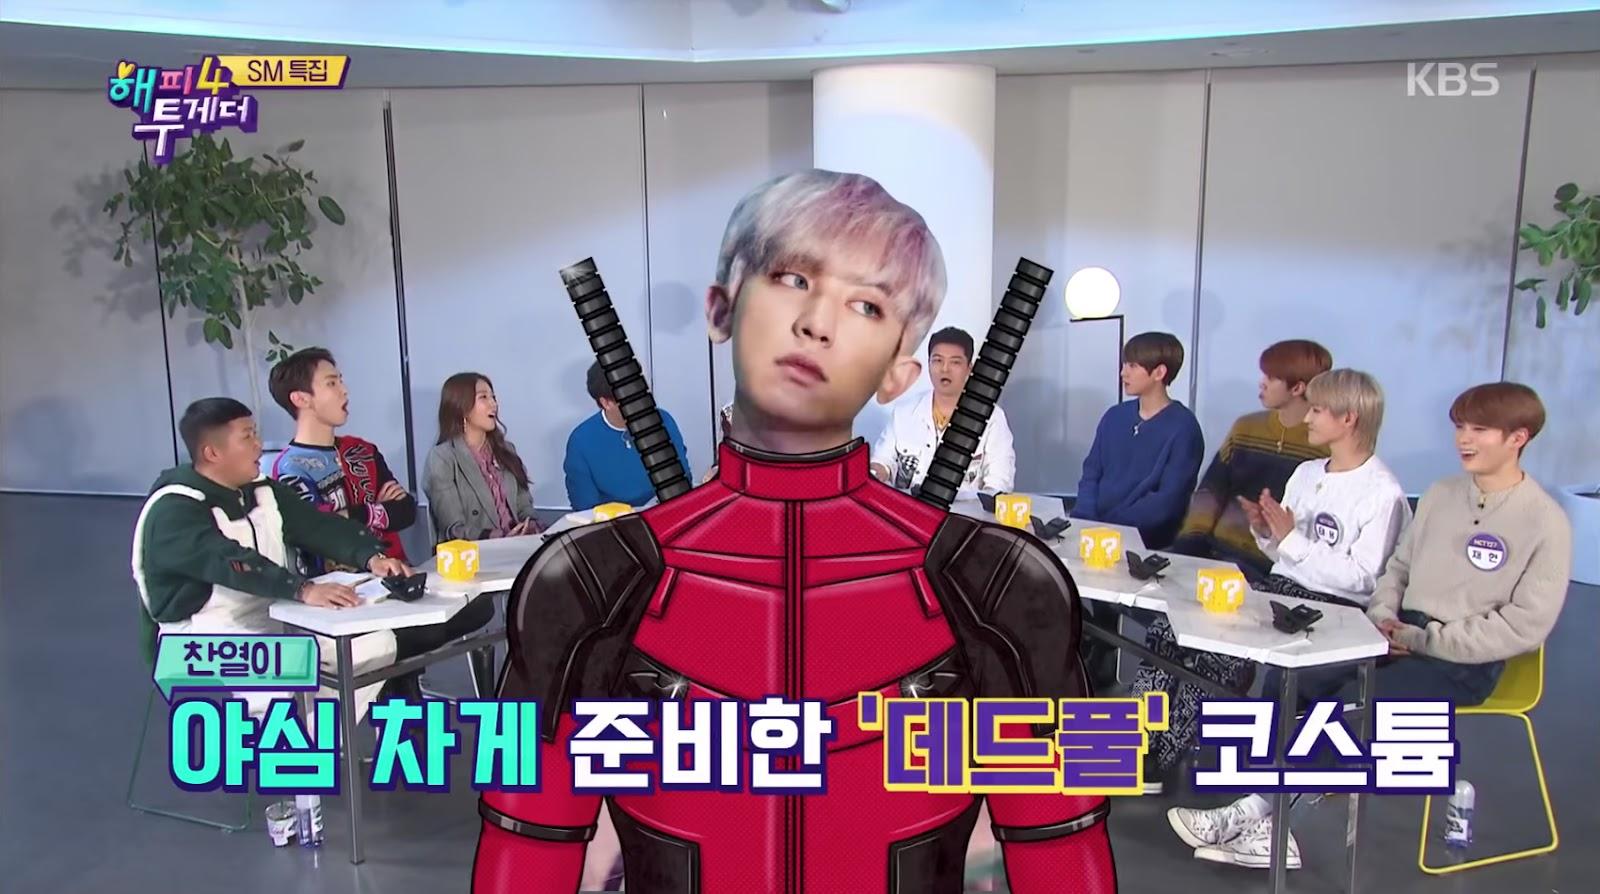 baekhyun chanyeol deadpool